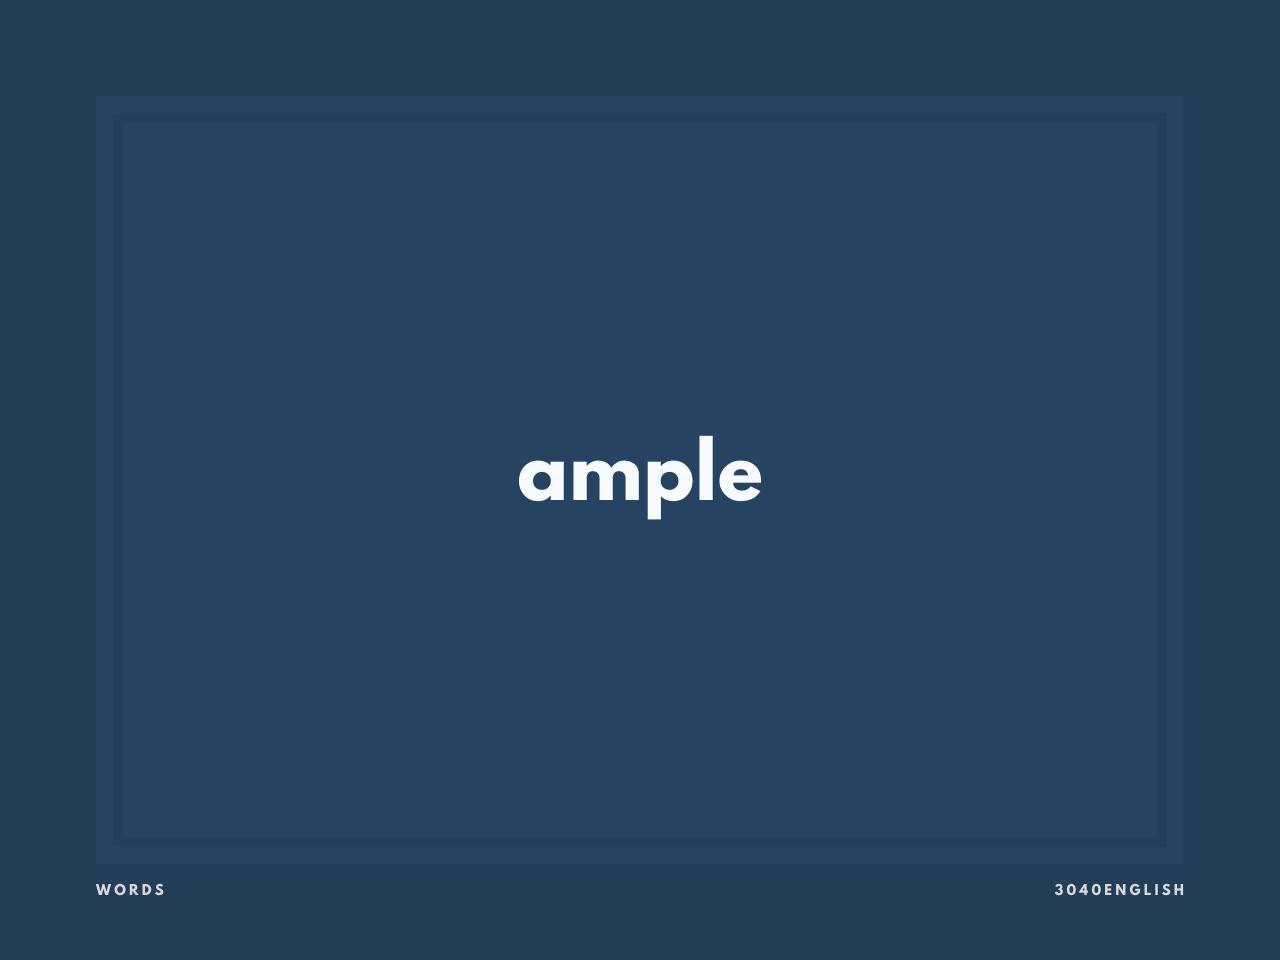 ample の意味と簡単な使い方【音読用例文あり】